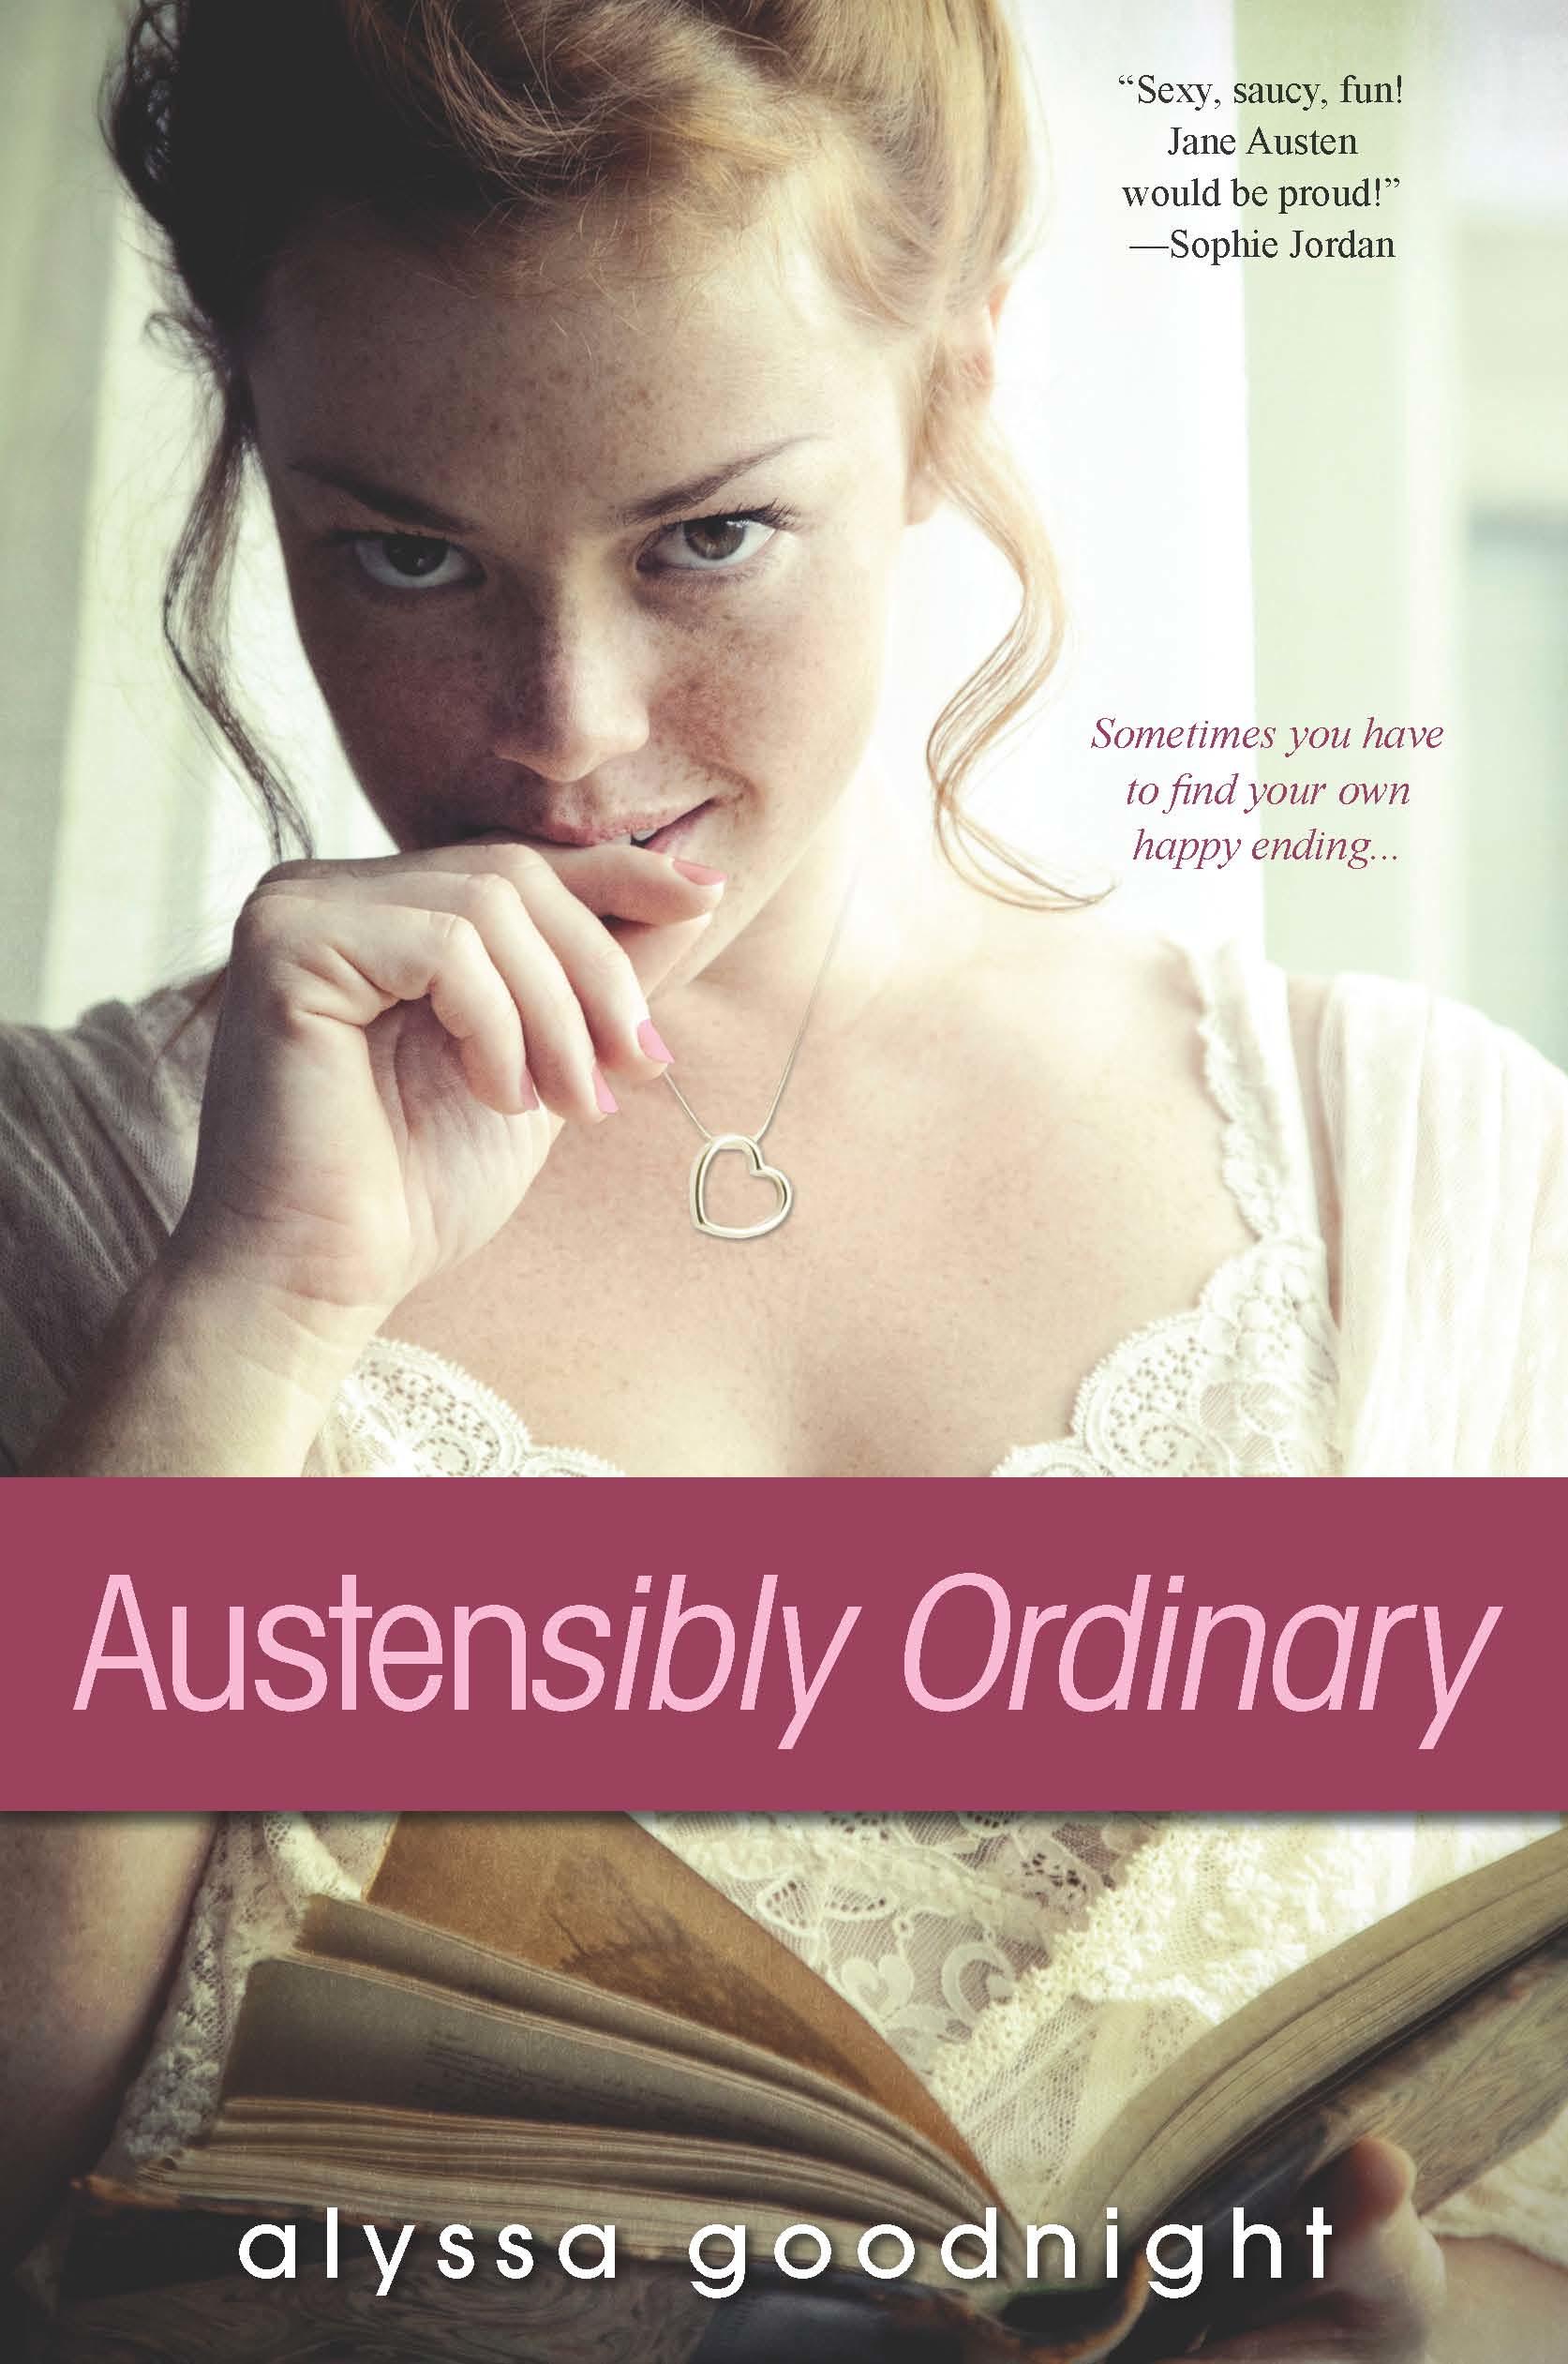 Austensibly Ordinary by Alyssa Goodnight